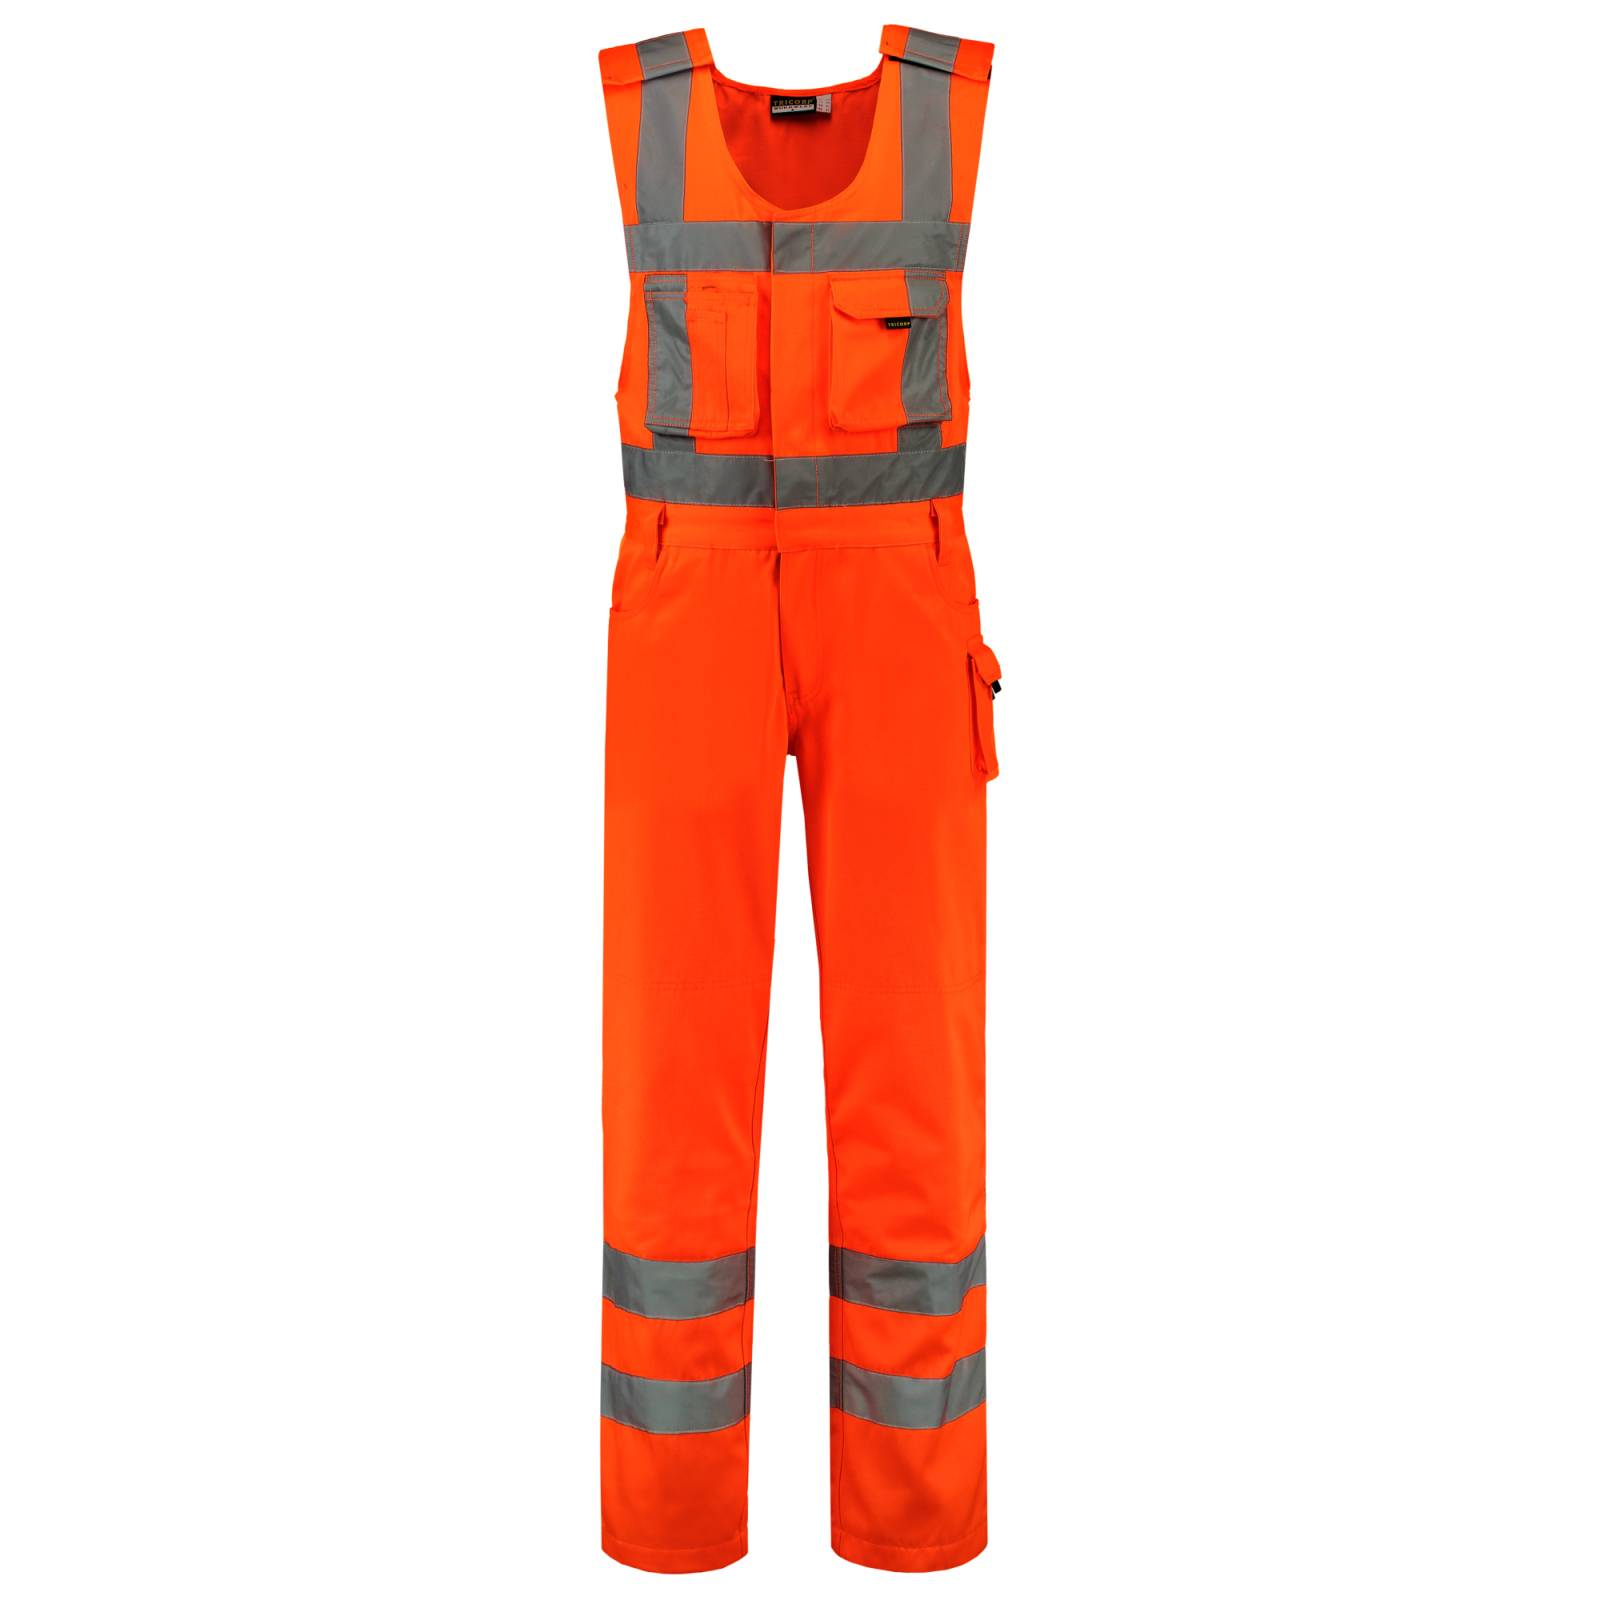 Tricorp Bodybroeken 753001-THR3001 Kniezakken Polyester- katoen fluo-oranje(Orange)